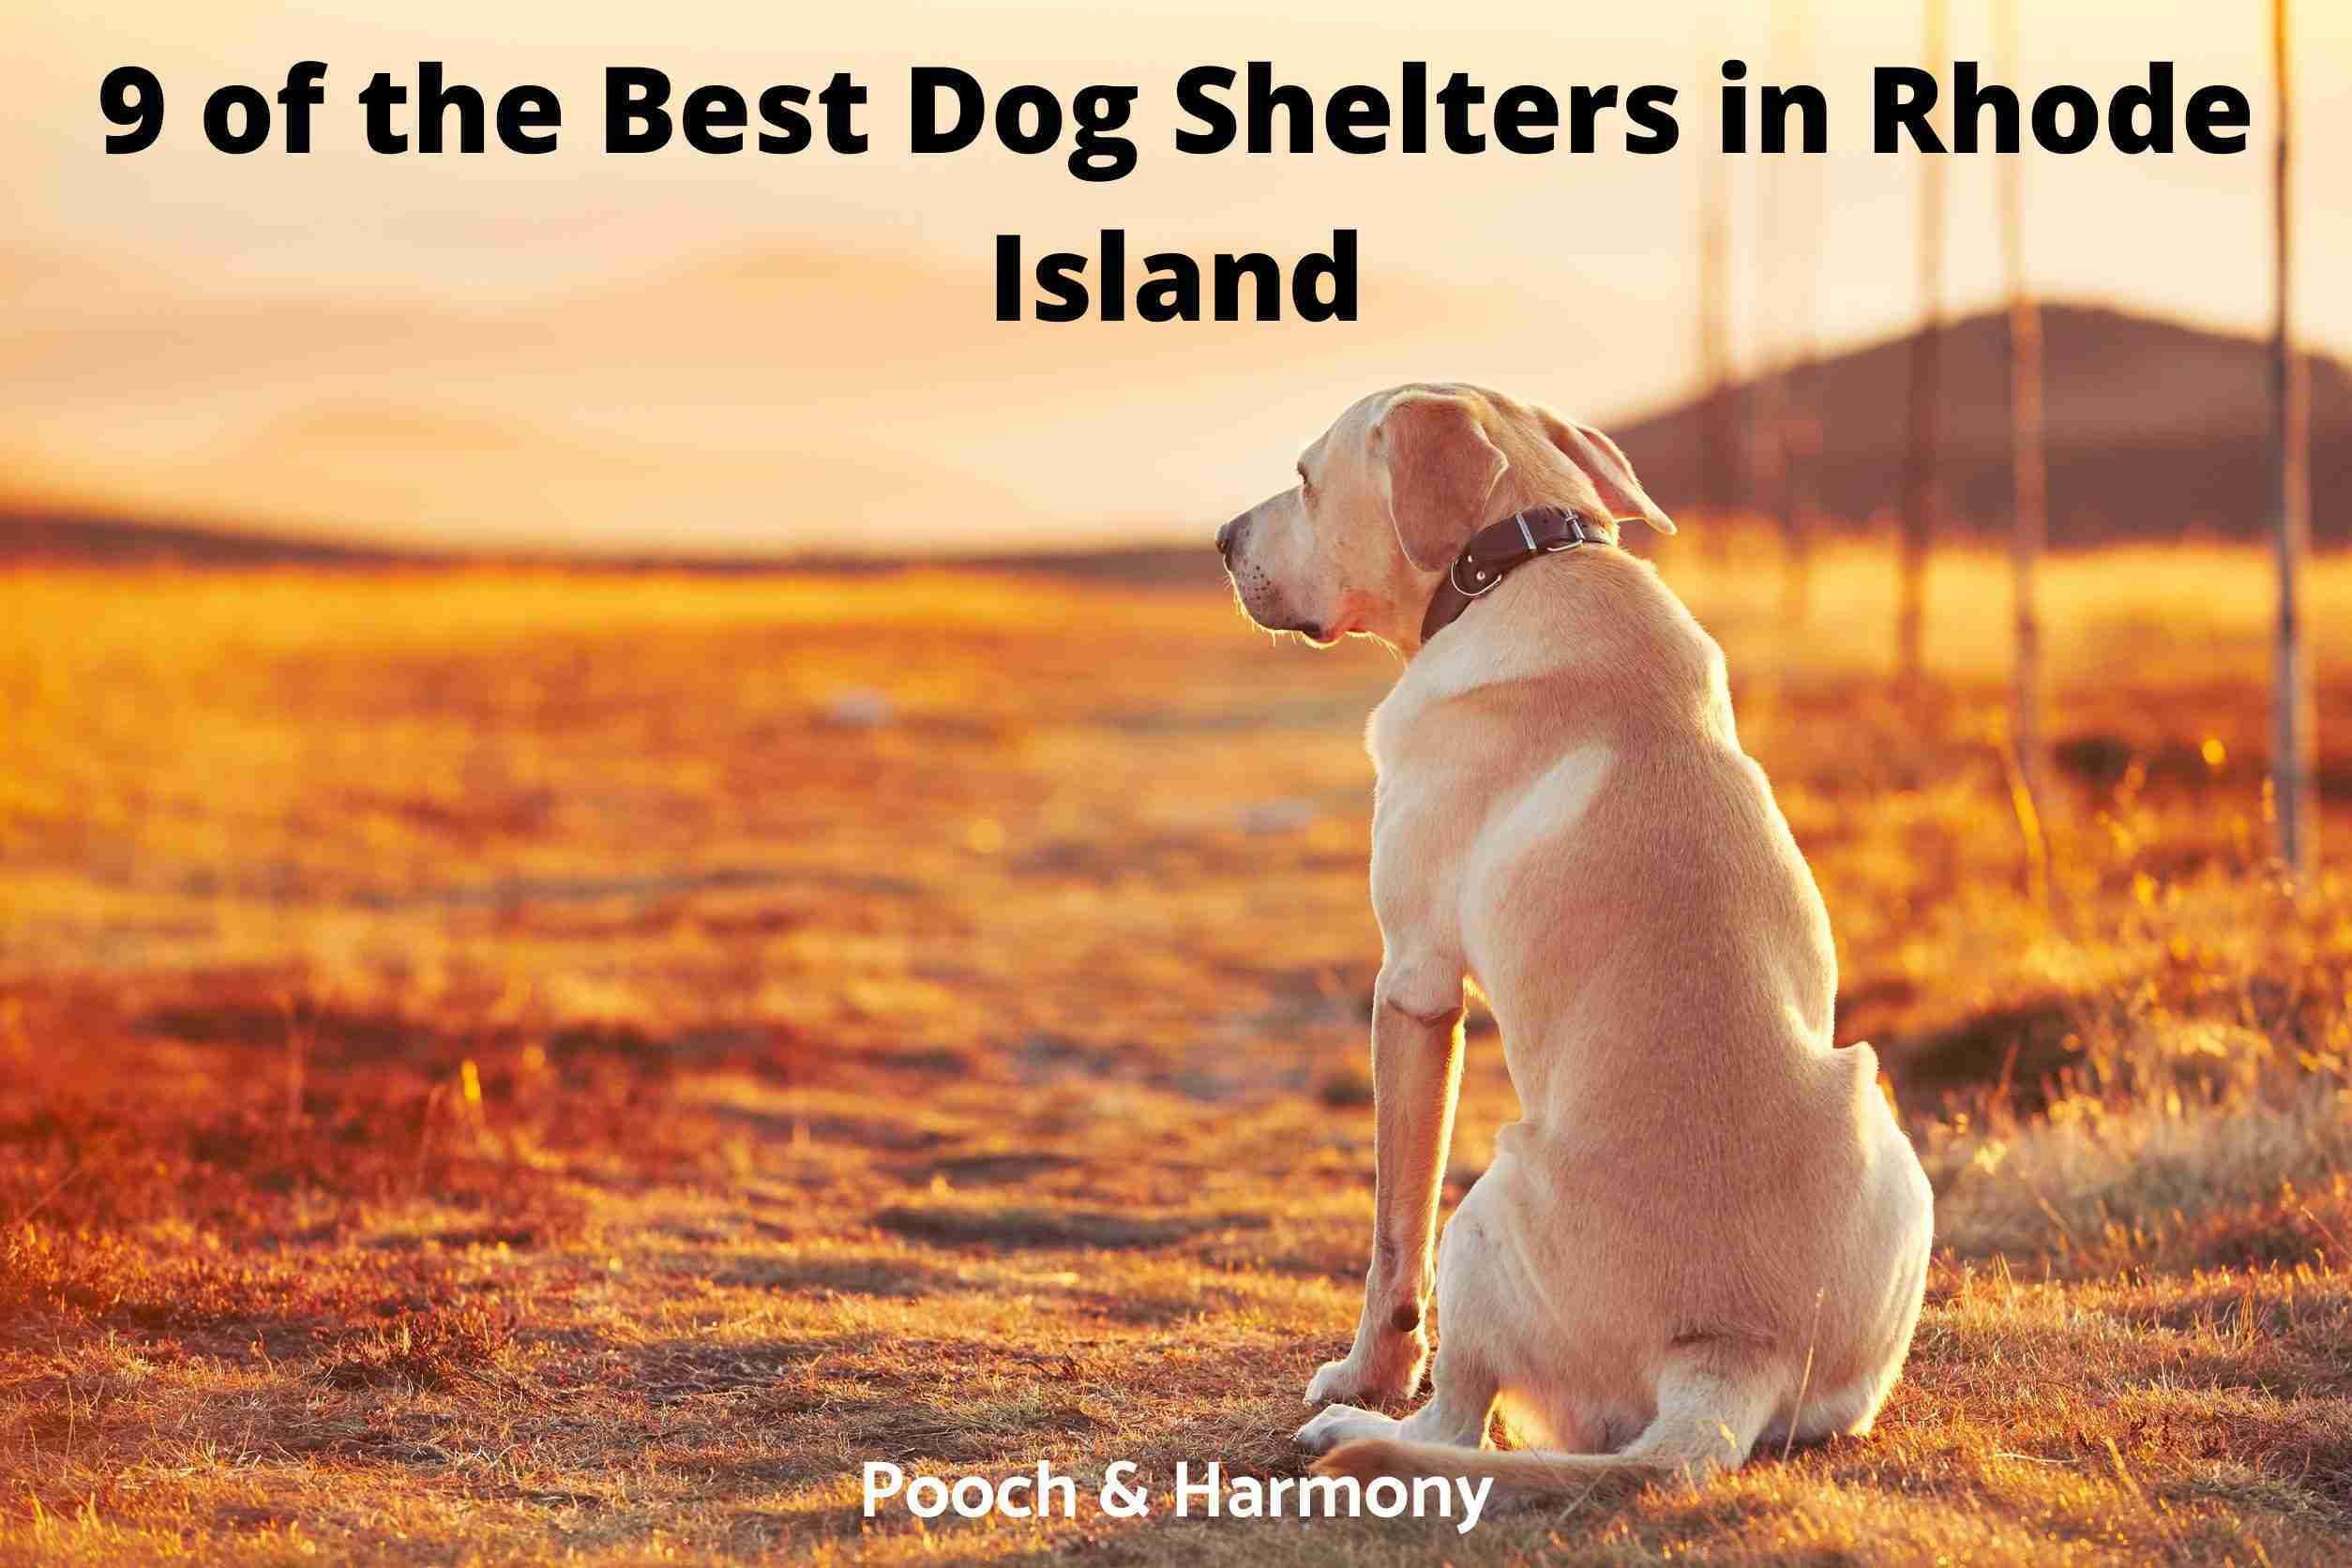 Best Dog Shelters in Rhode Island